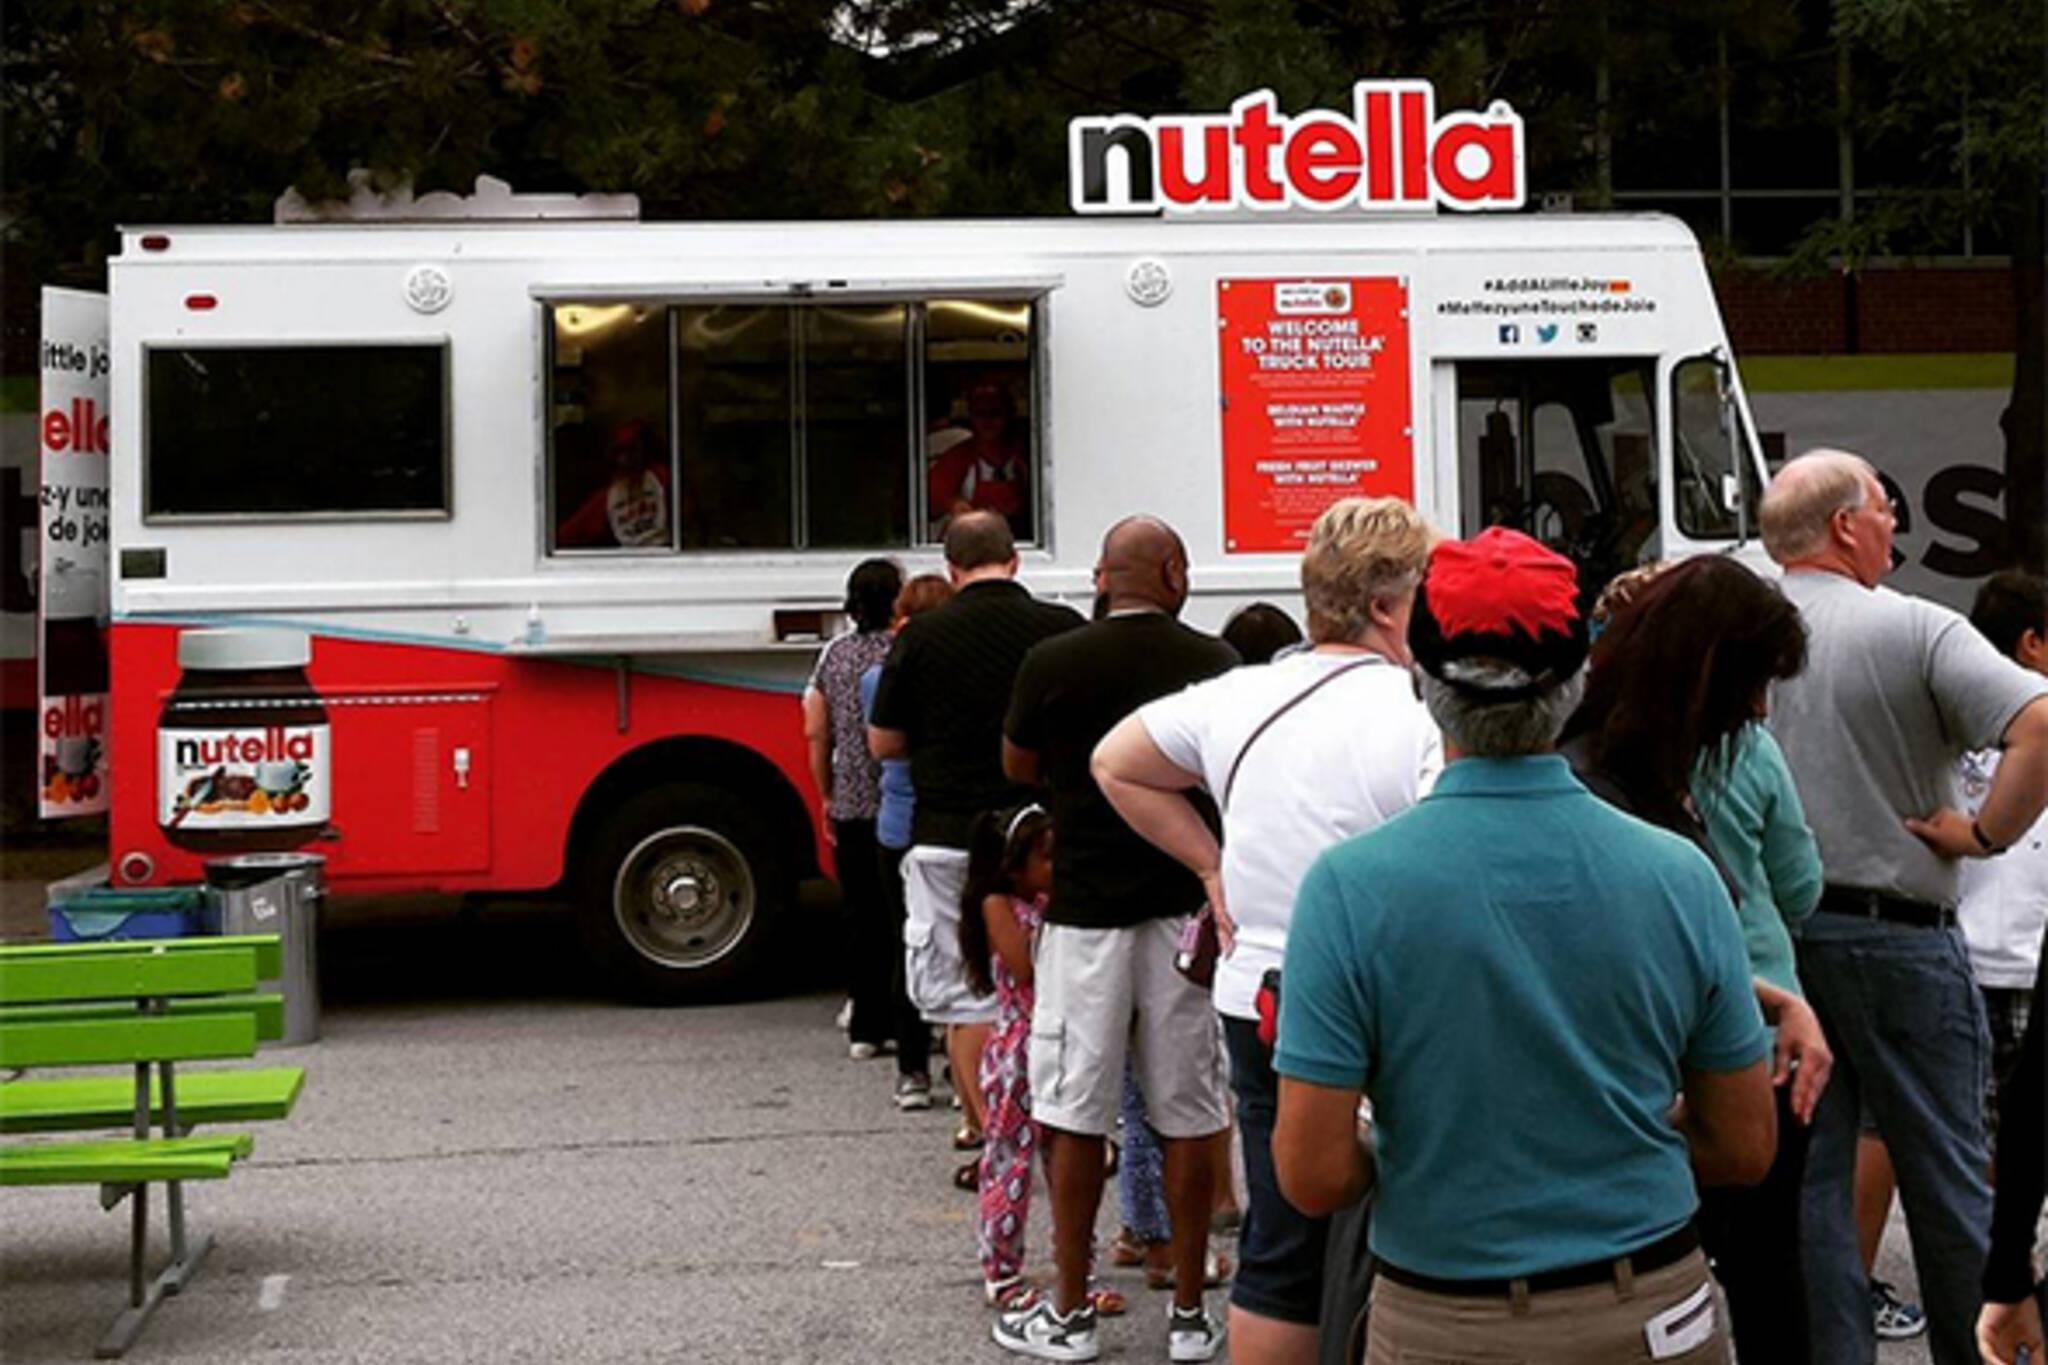 Nutella food truck